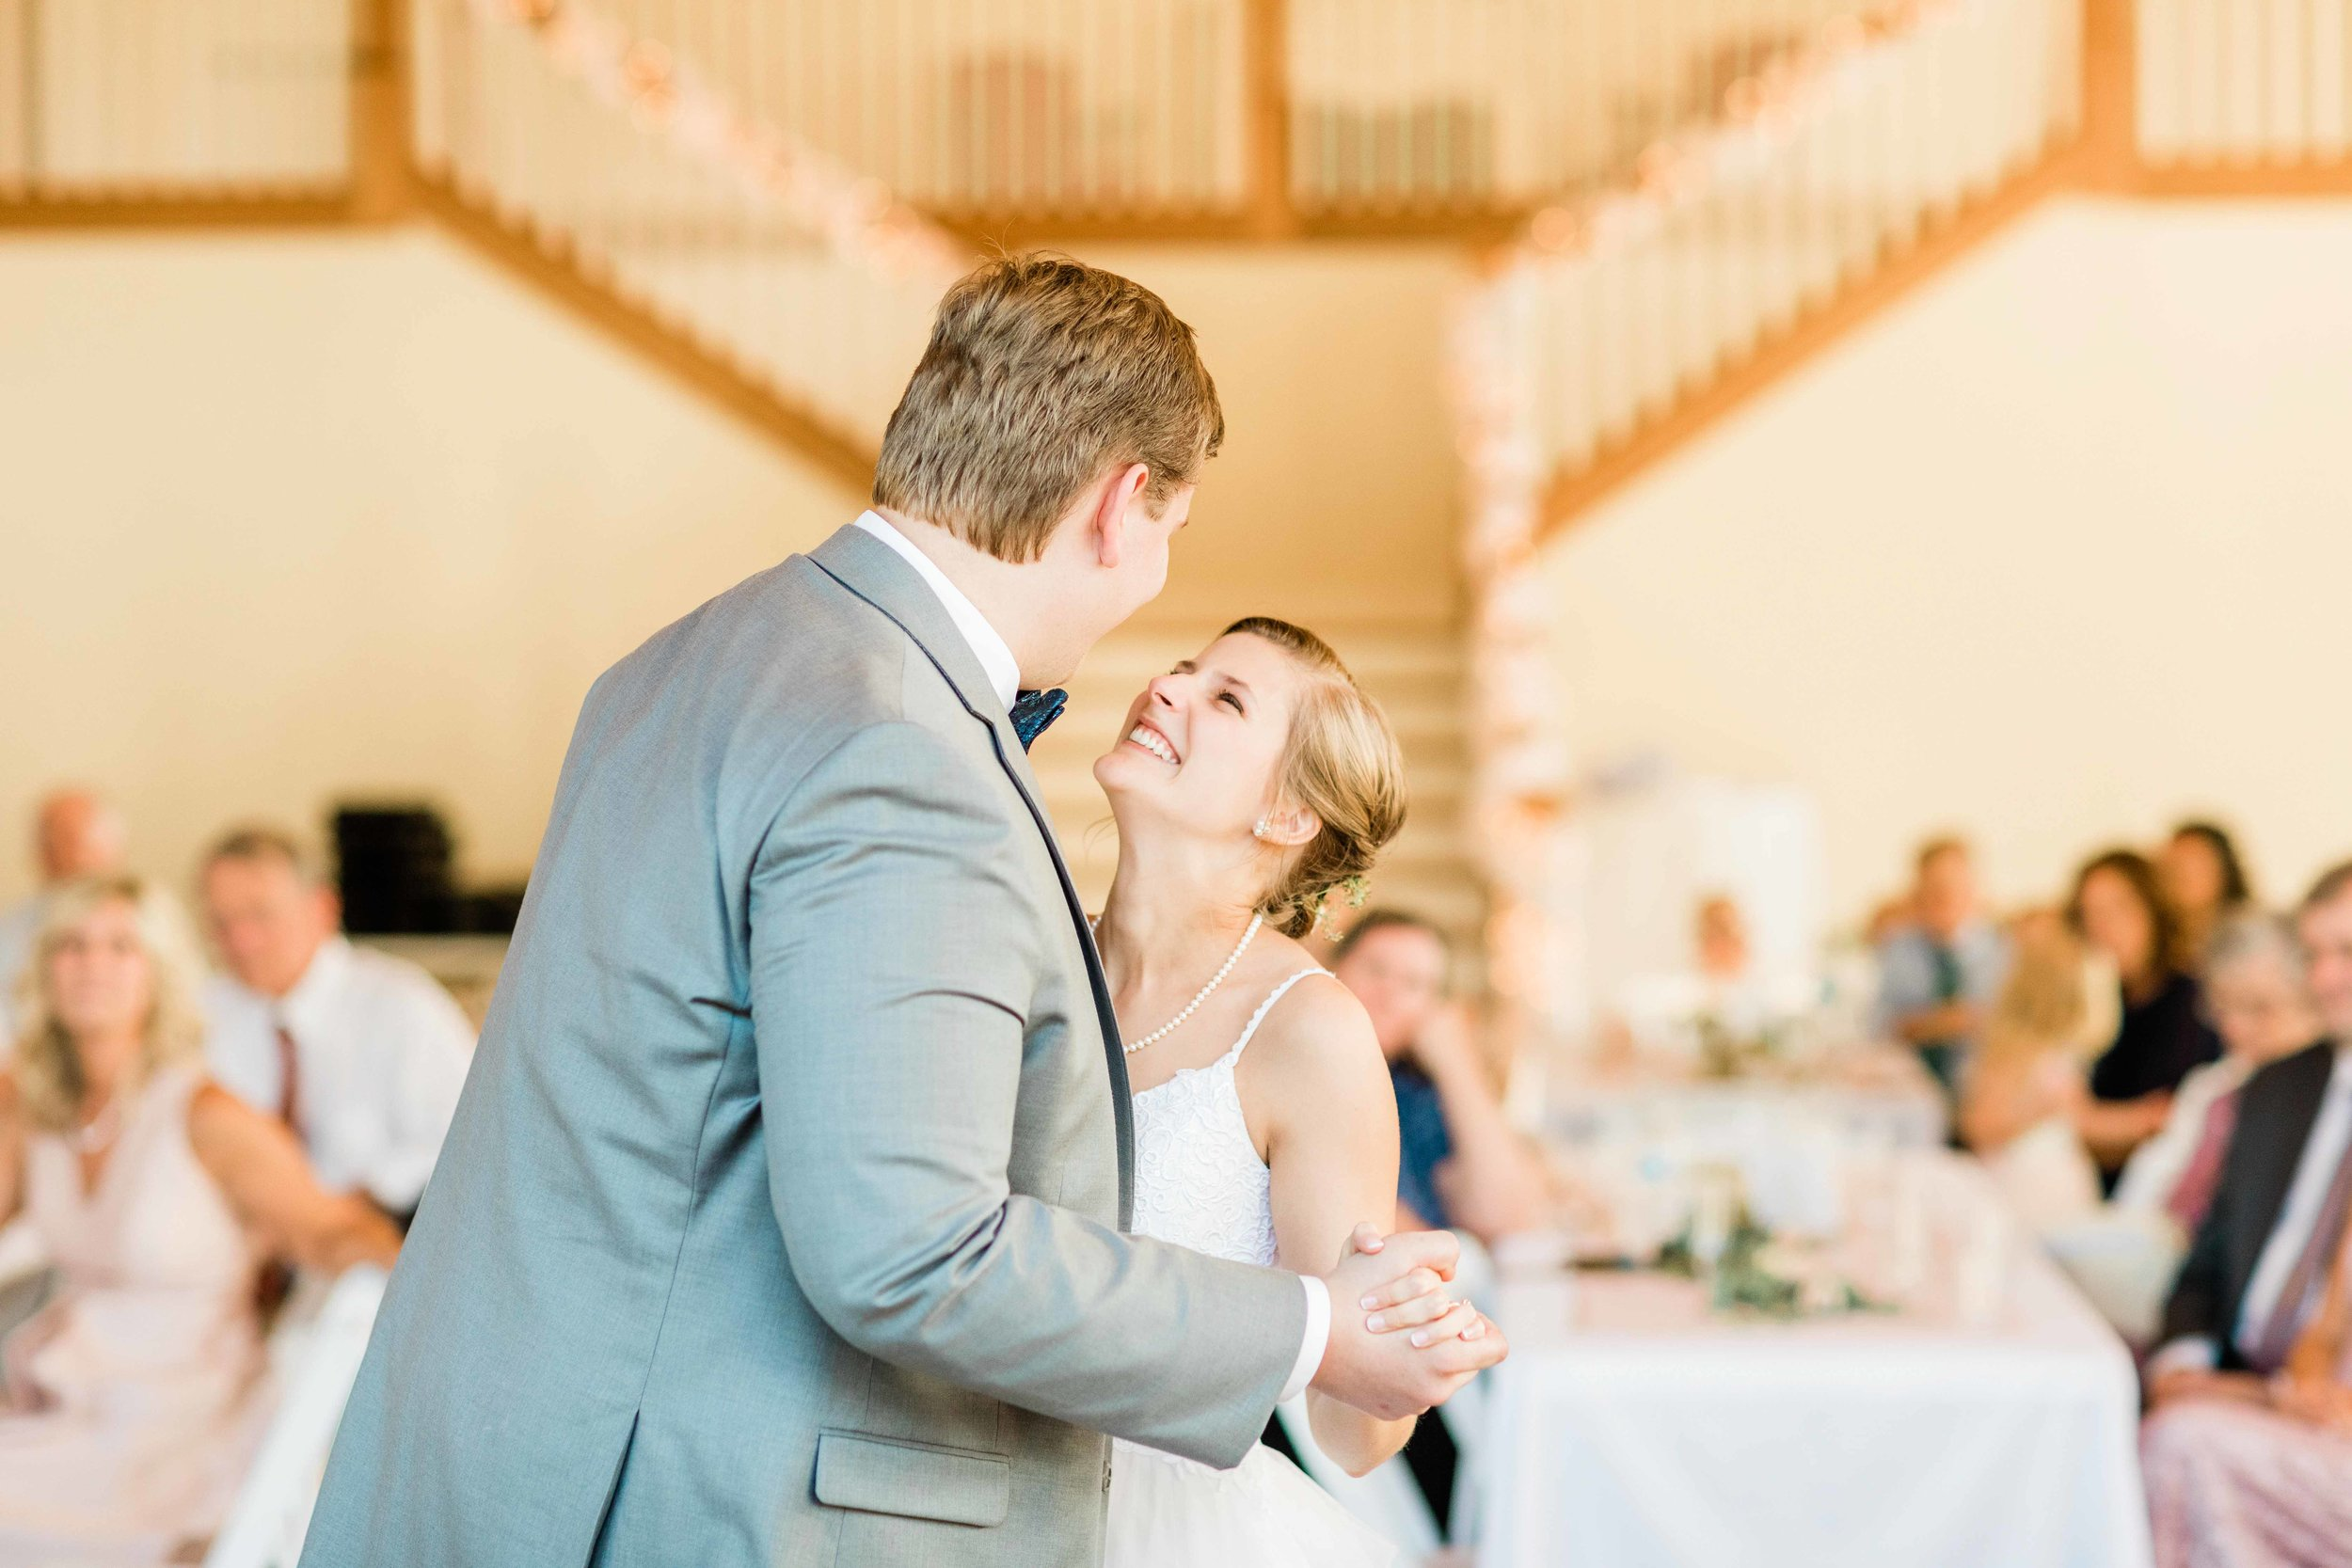 rosewood manor miamisburg wedding photos-8.jpg